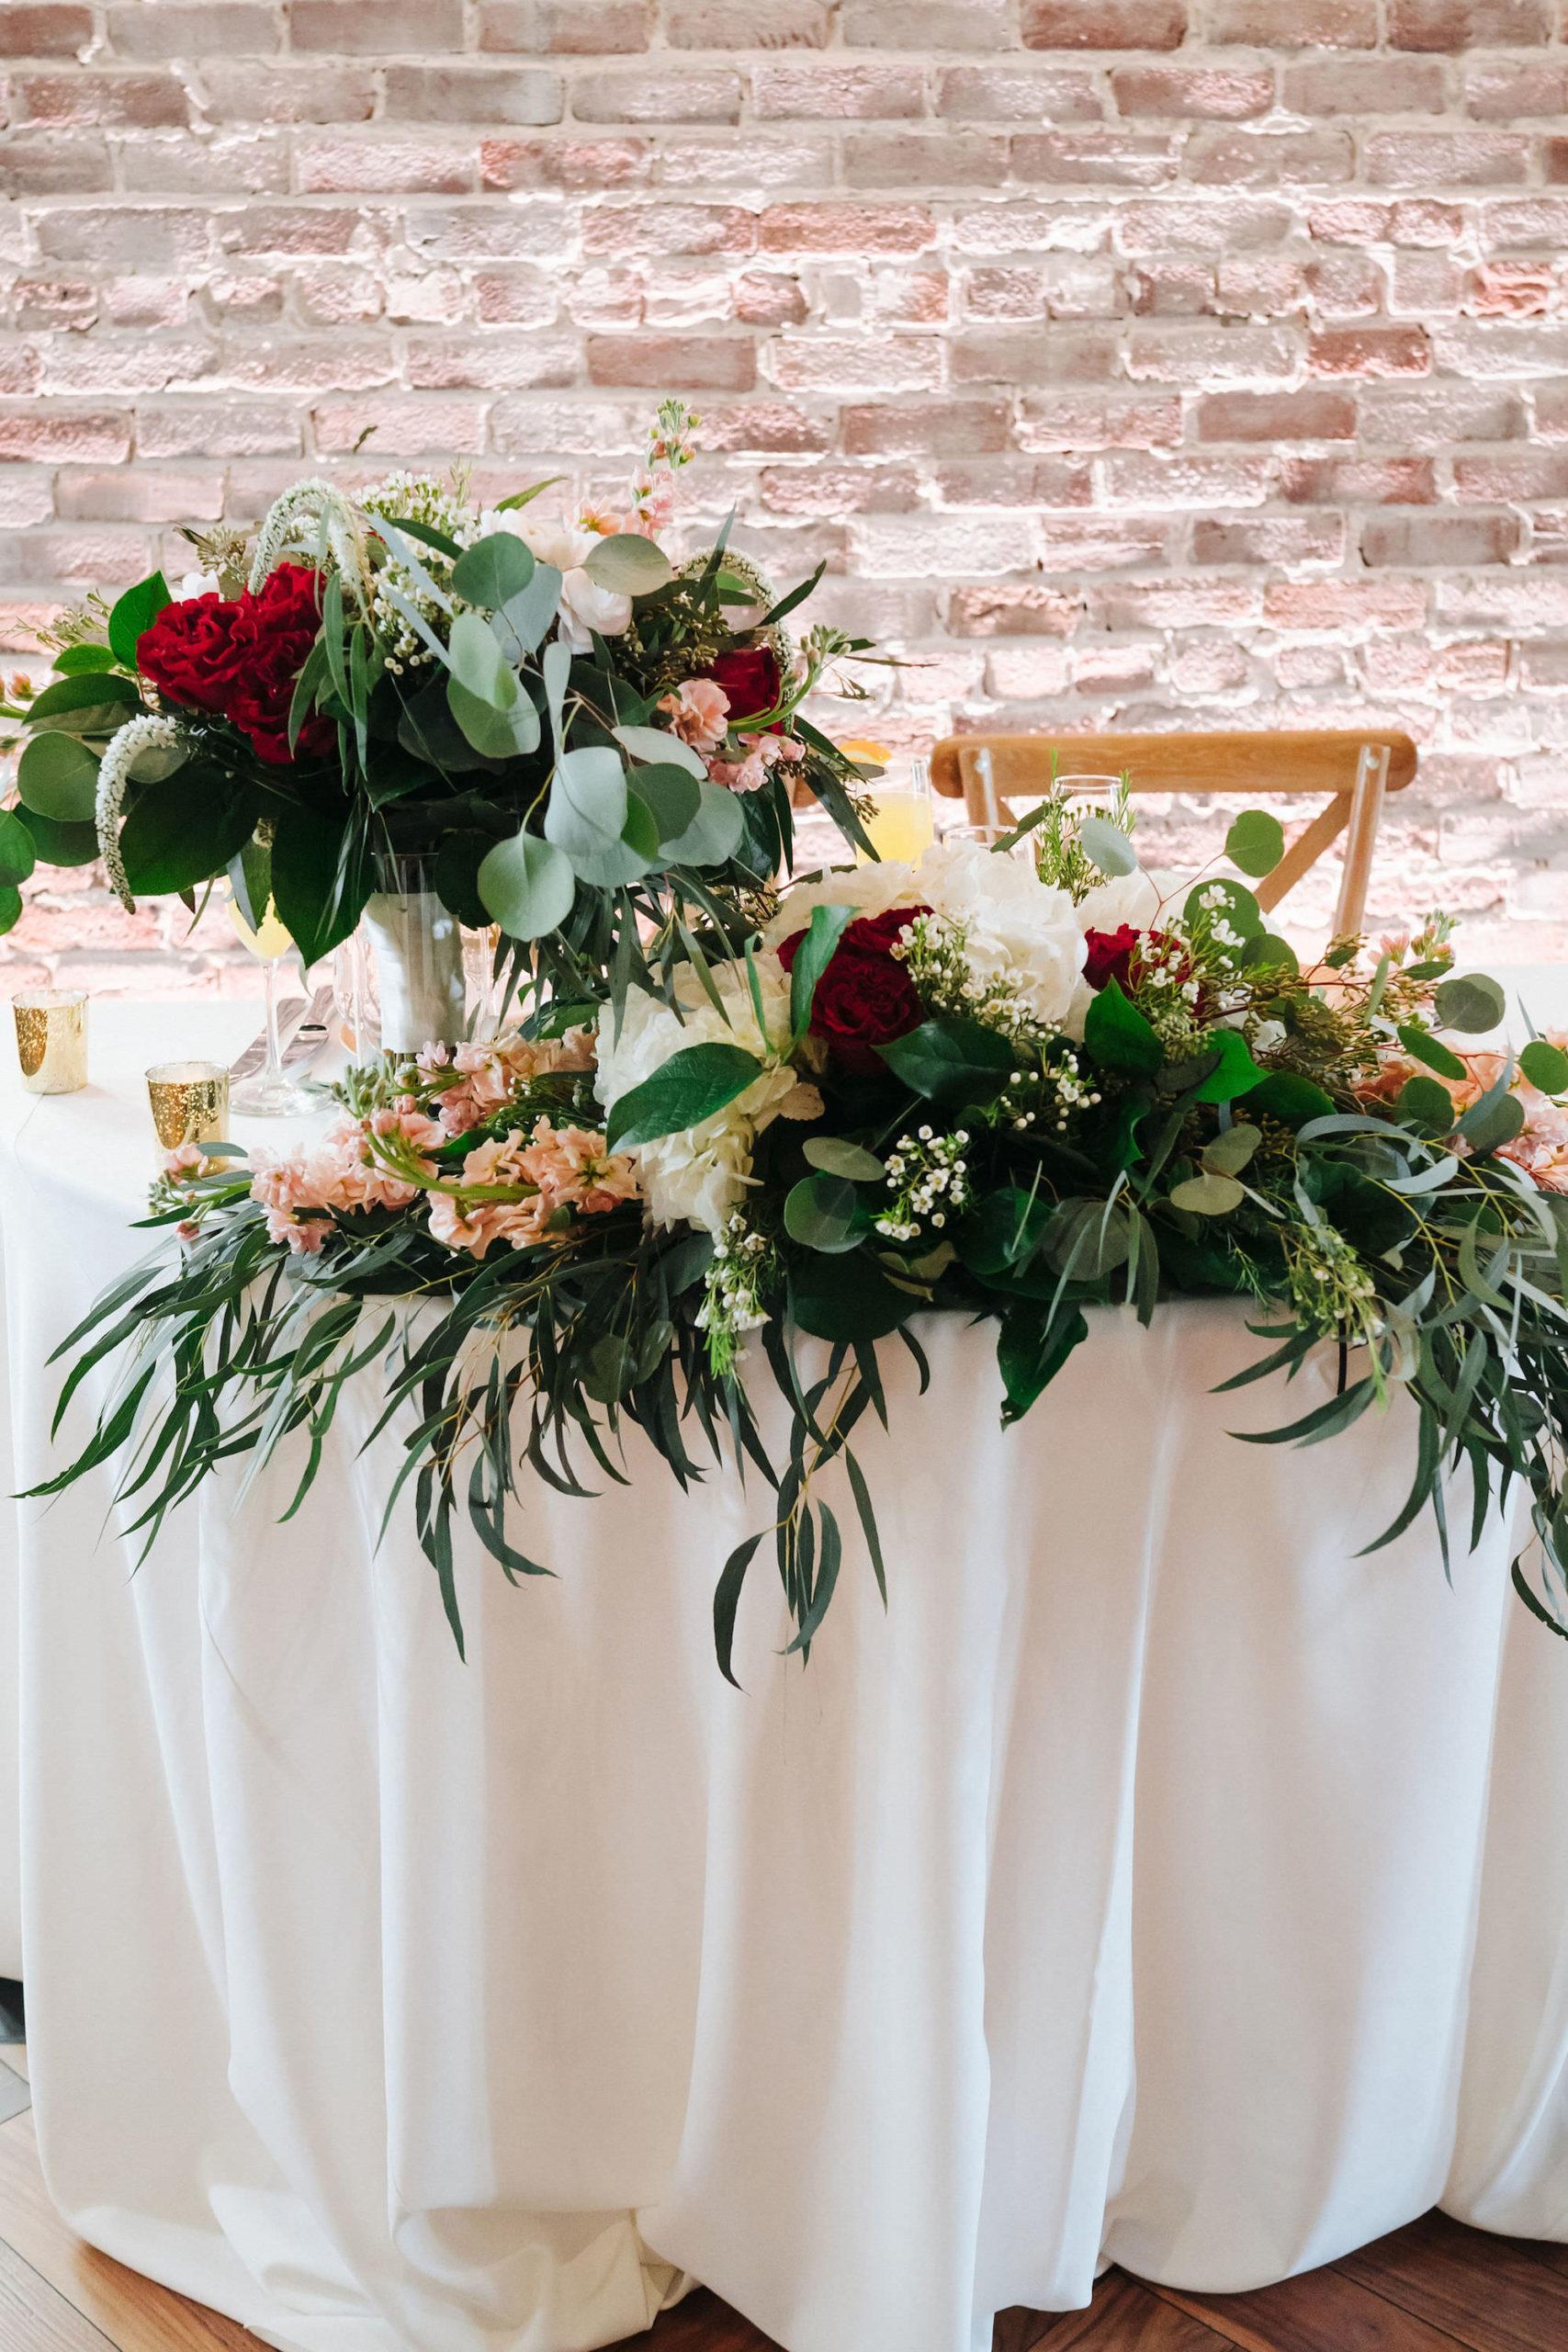 St. Pete Wedding   Bride and Groom Sweetheart Table   Blush Red Garnet Greenery Natural Boho Floral Arrangement